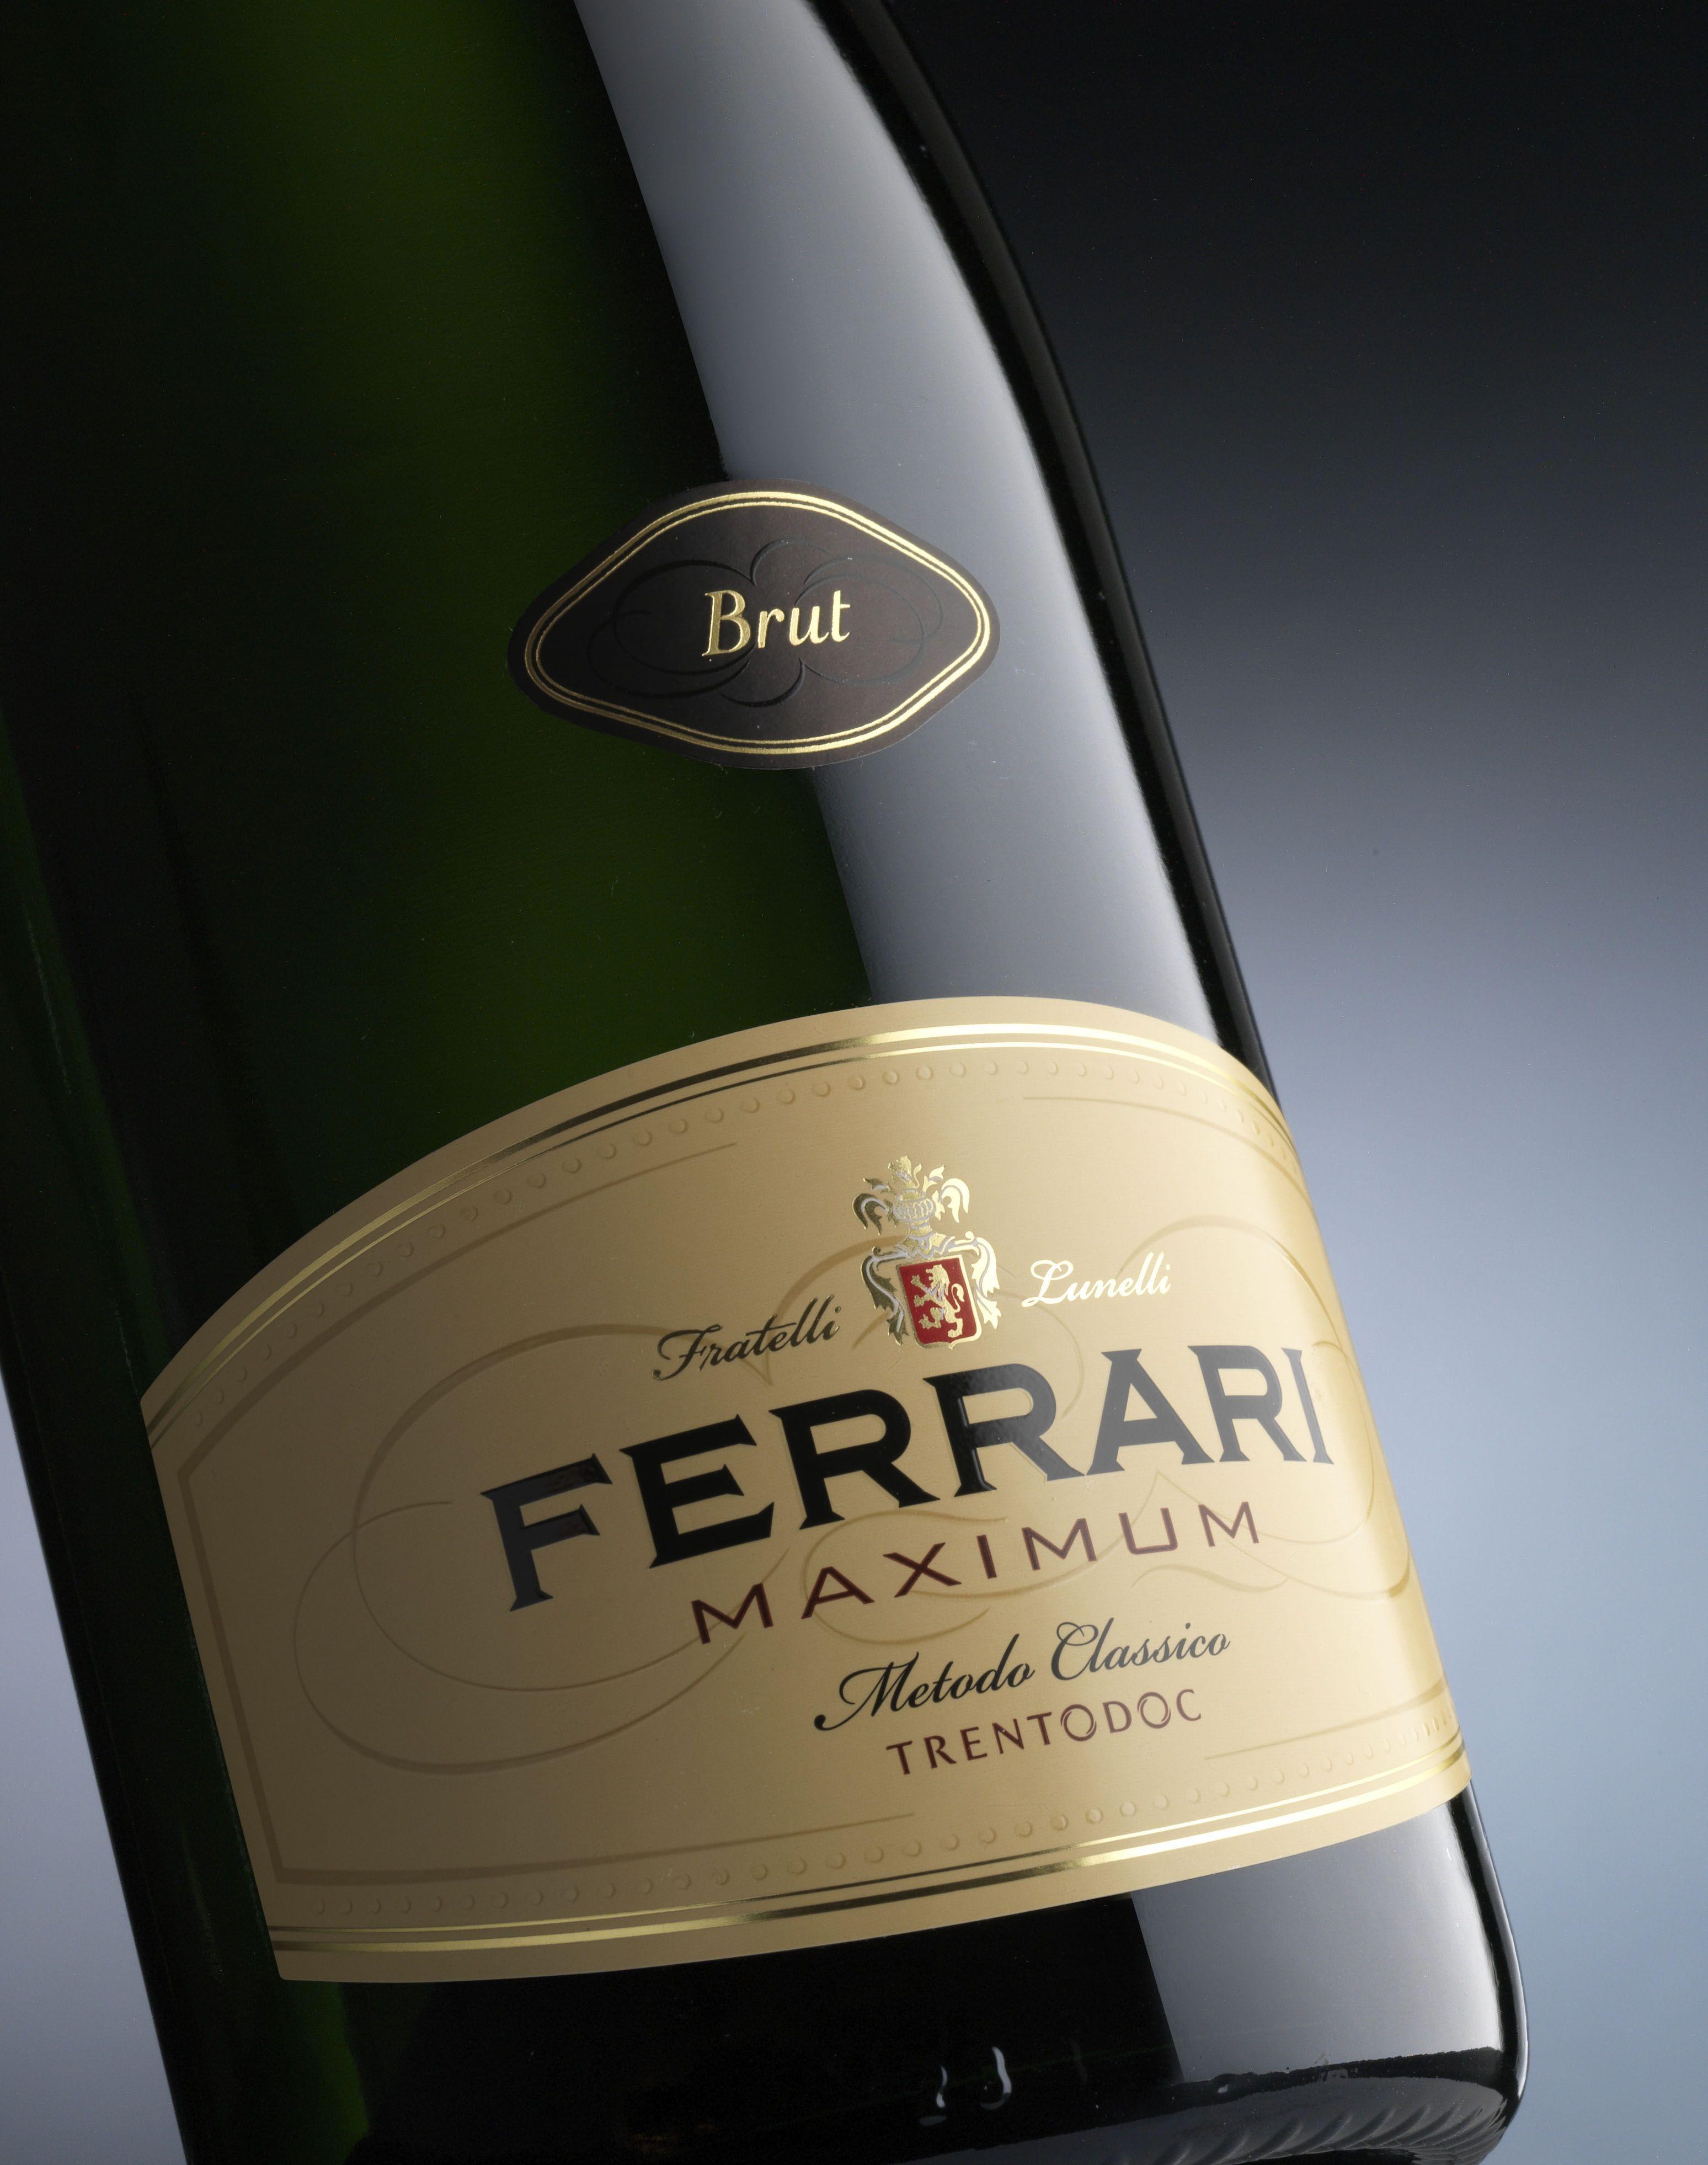 FERRARI Maximum - Fratelli Lunelli - Trentino, Italy | Trentino-Alto ...